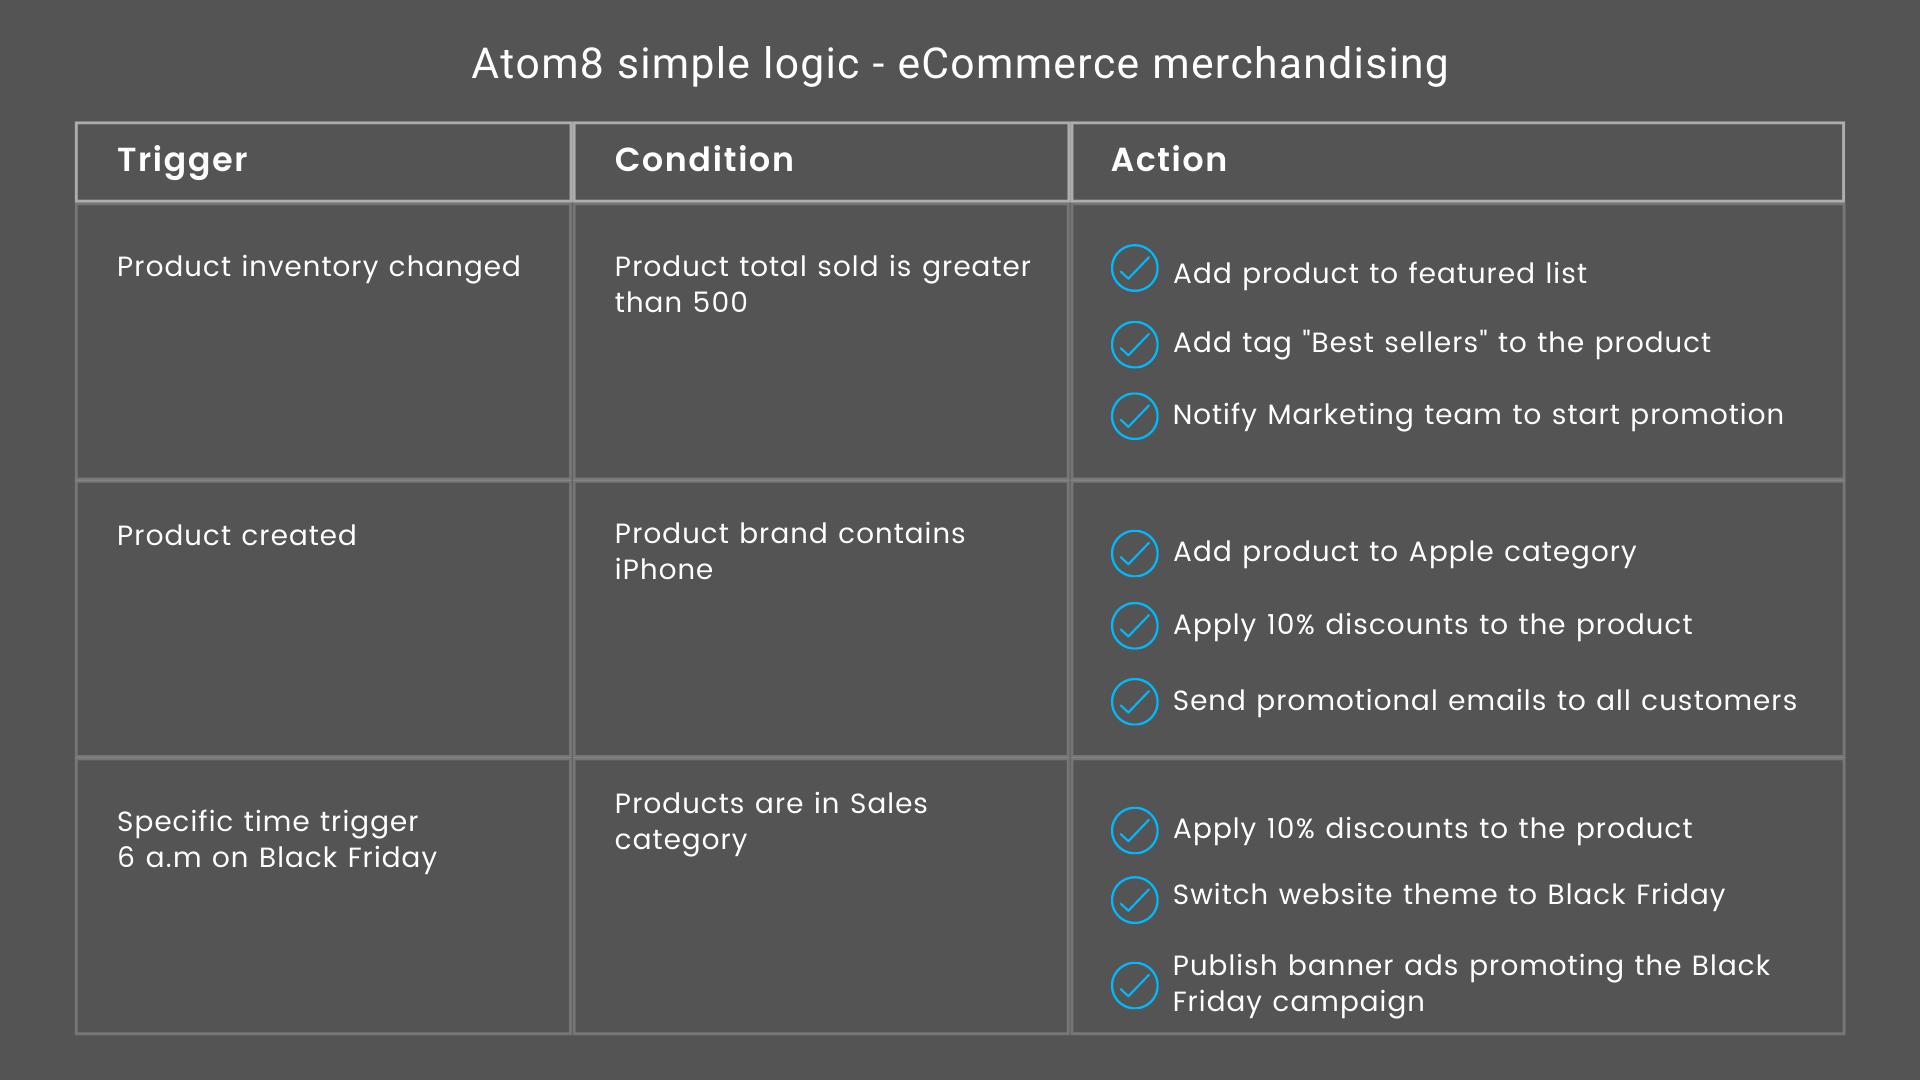 Atom8 simple logic for ecommerce merchandising